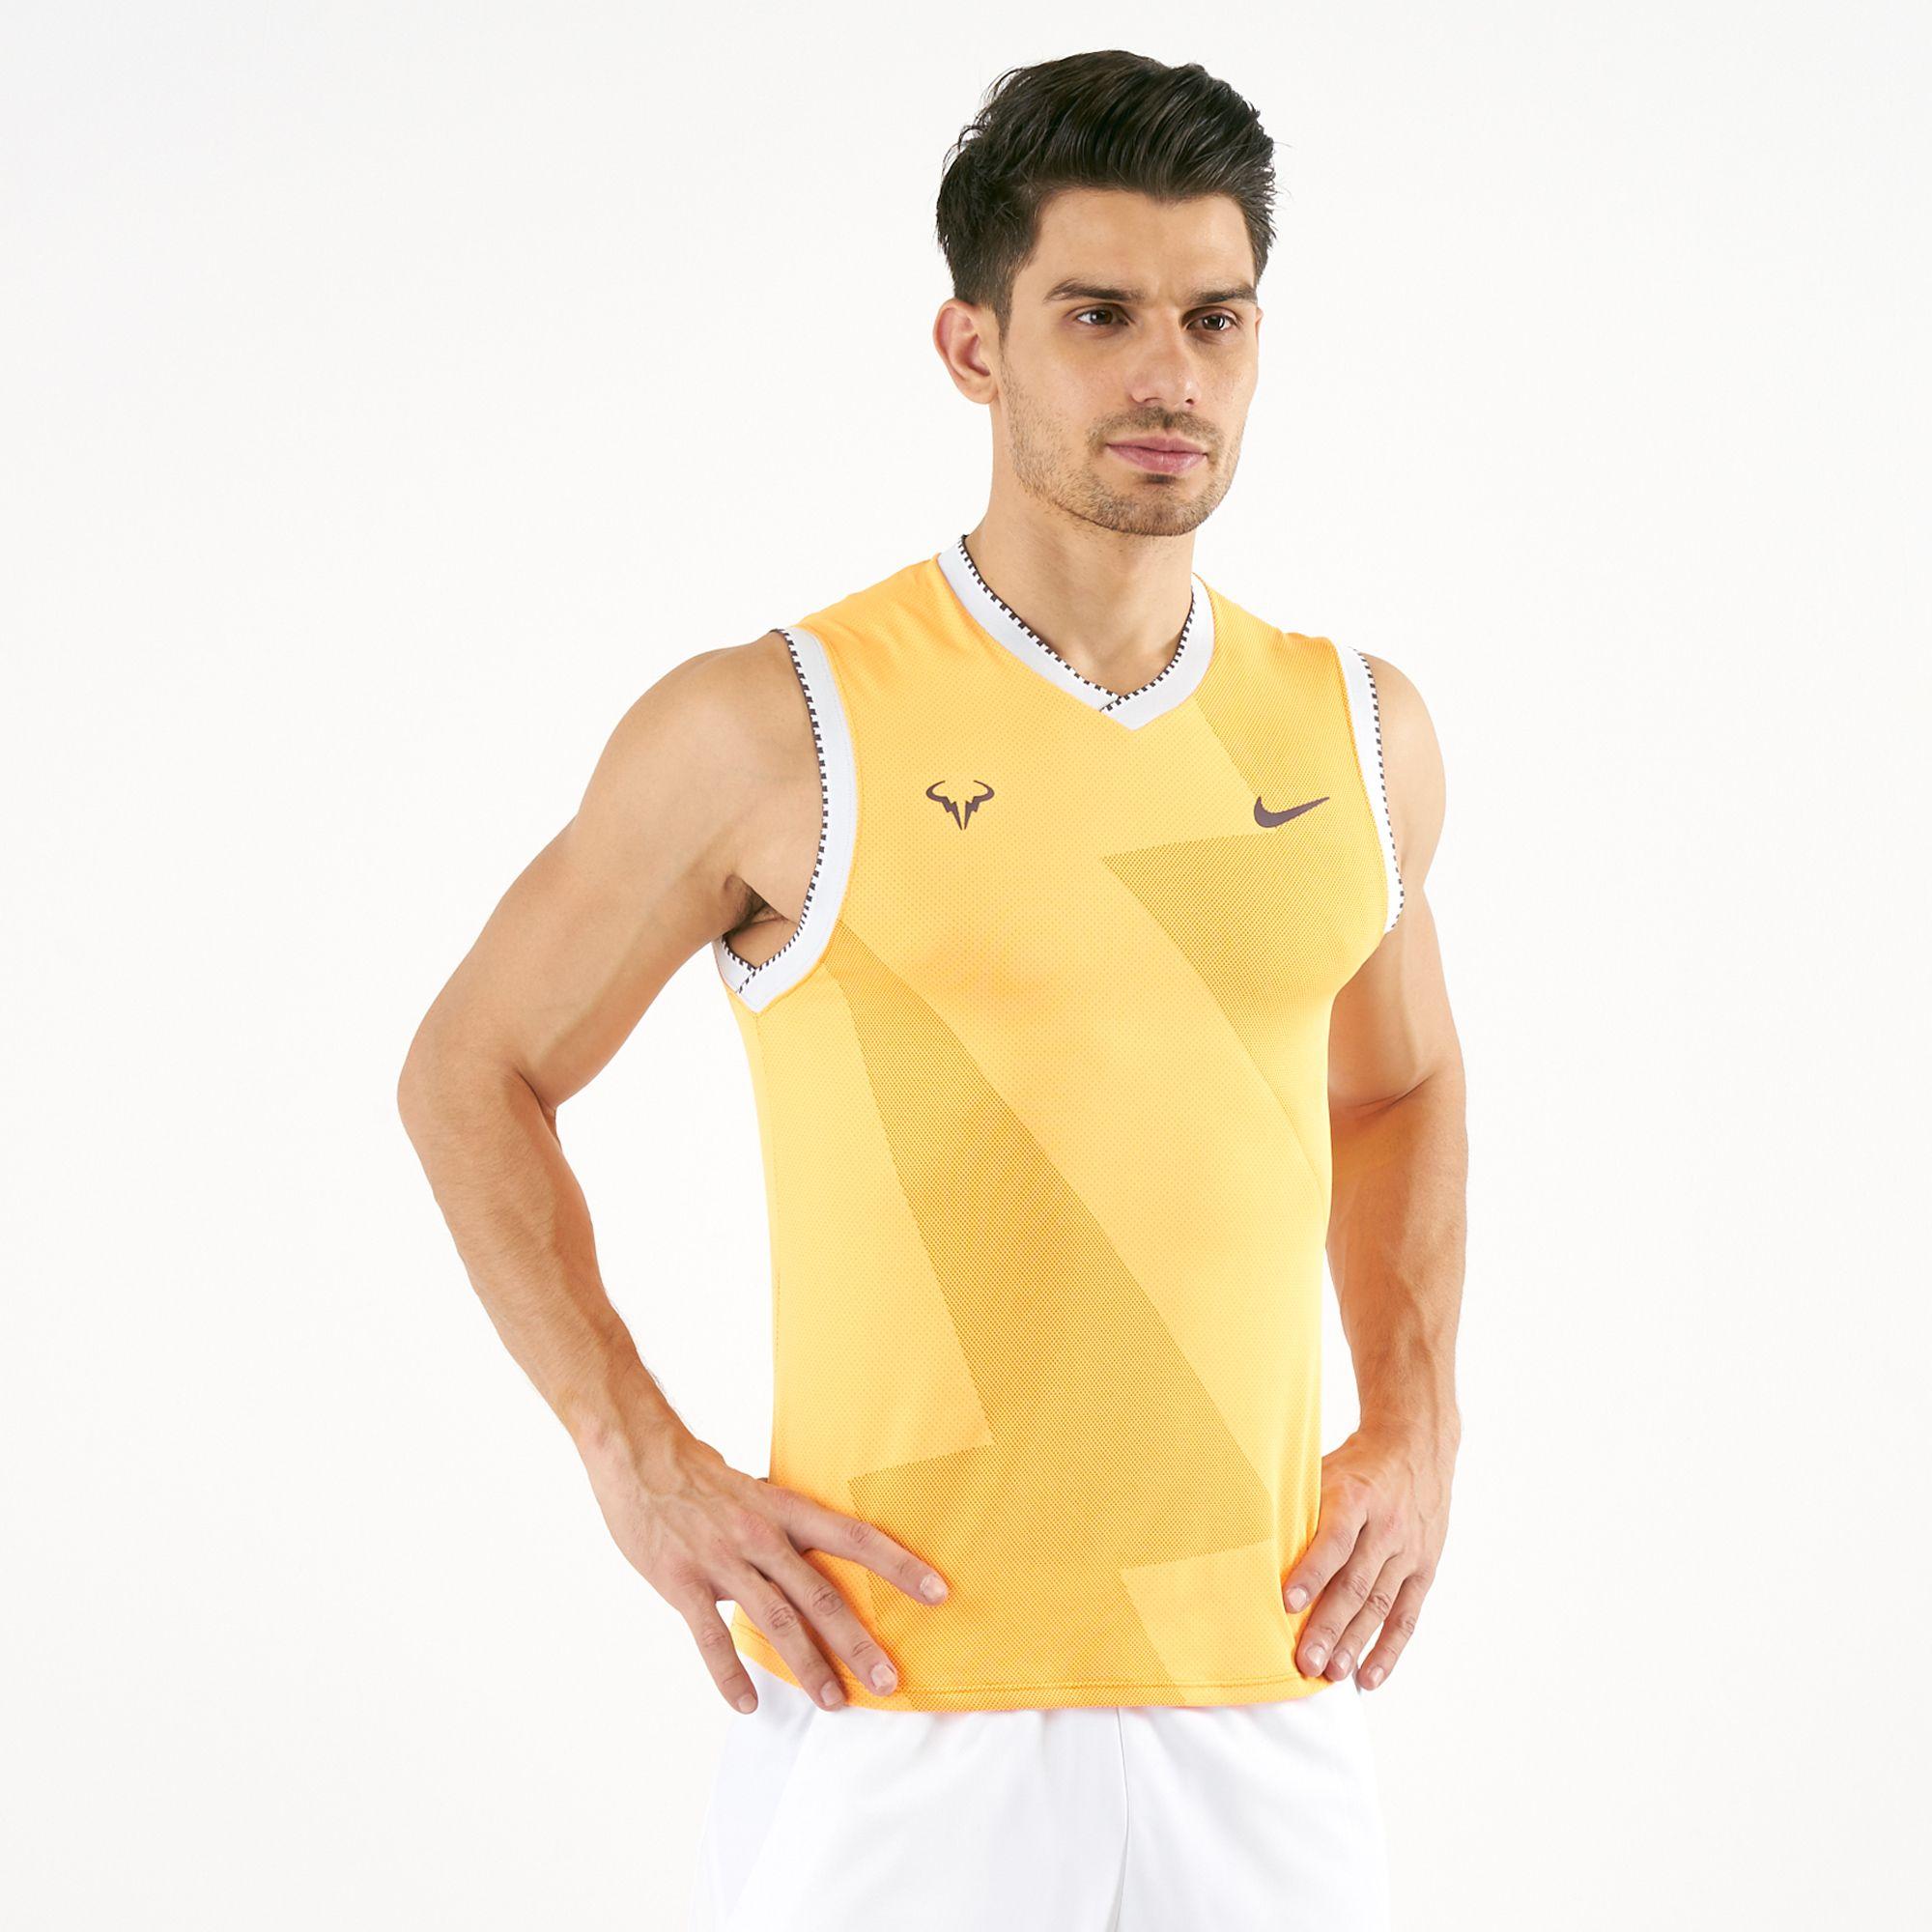 Nike Men S Court Aeroreact Rafael Nadal Sleeveless T Shirt T Shirts Tops Clothing Men S Sale Sale Sss